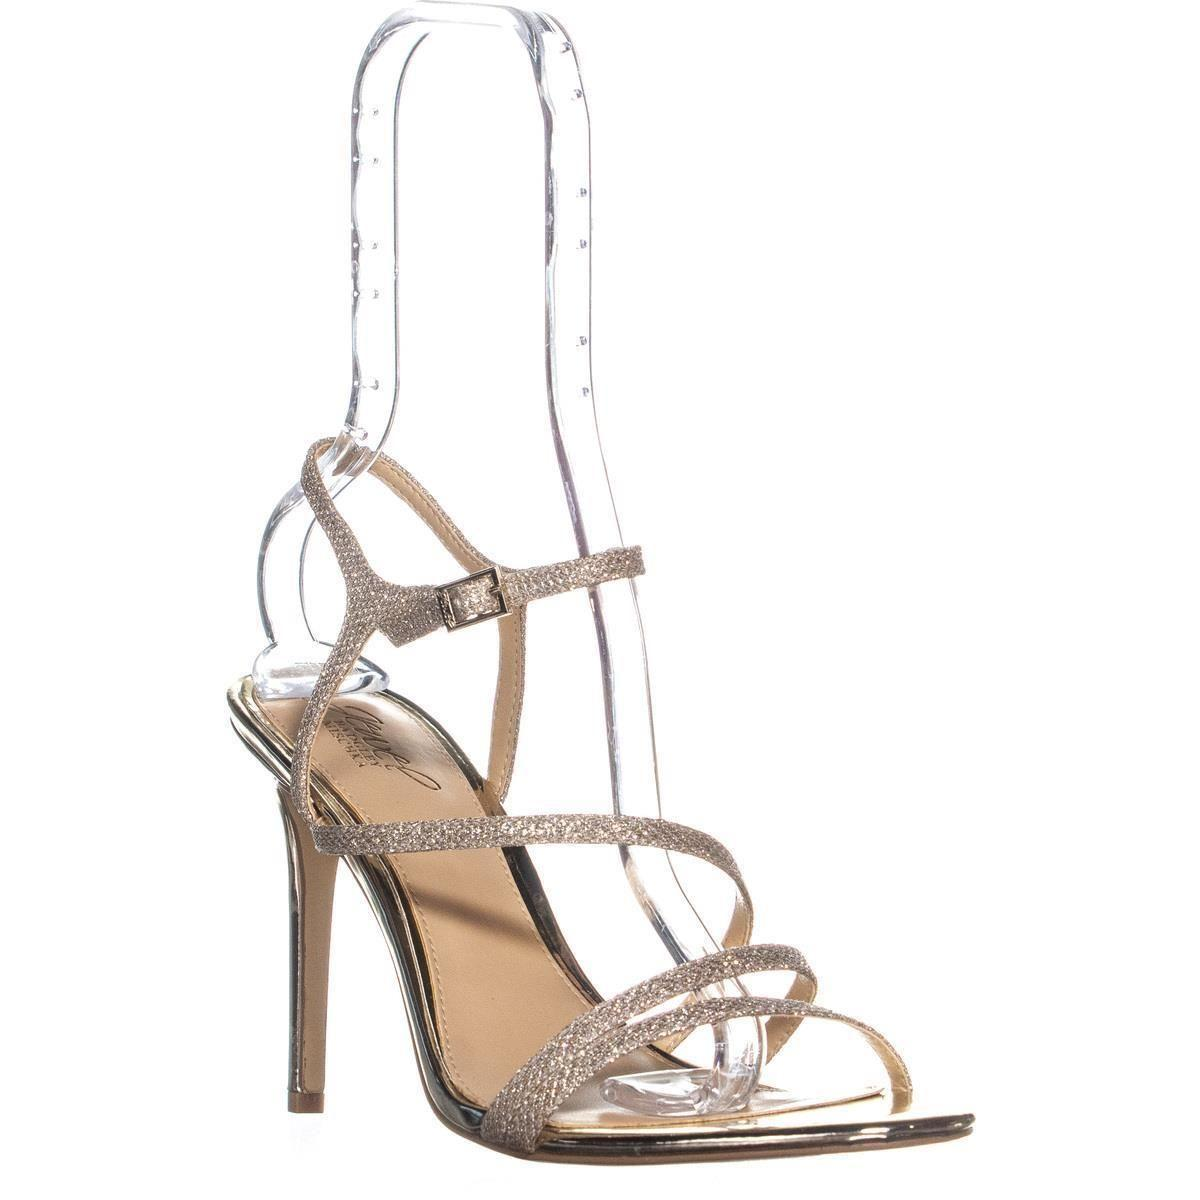 cba5839d776c Lyst - Badgley Mischka Jewel Maddison Heeled Sandals in Metallic